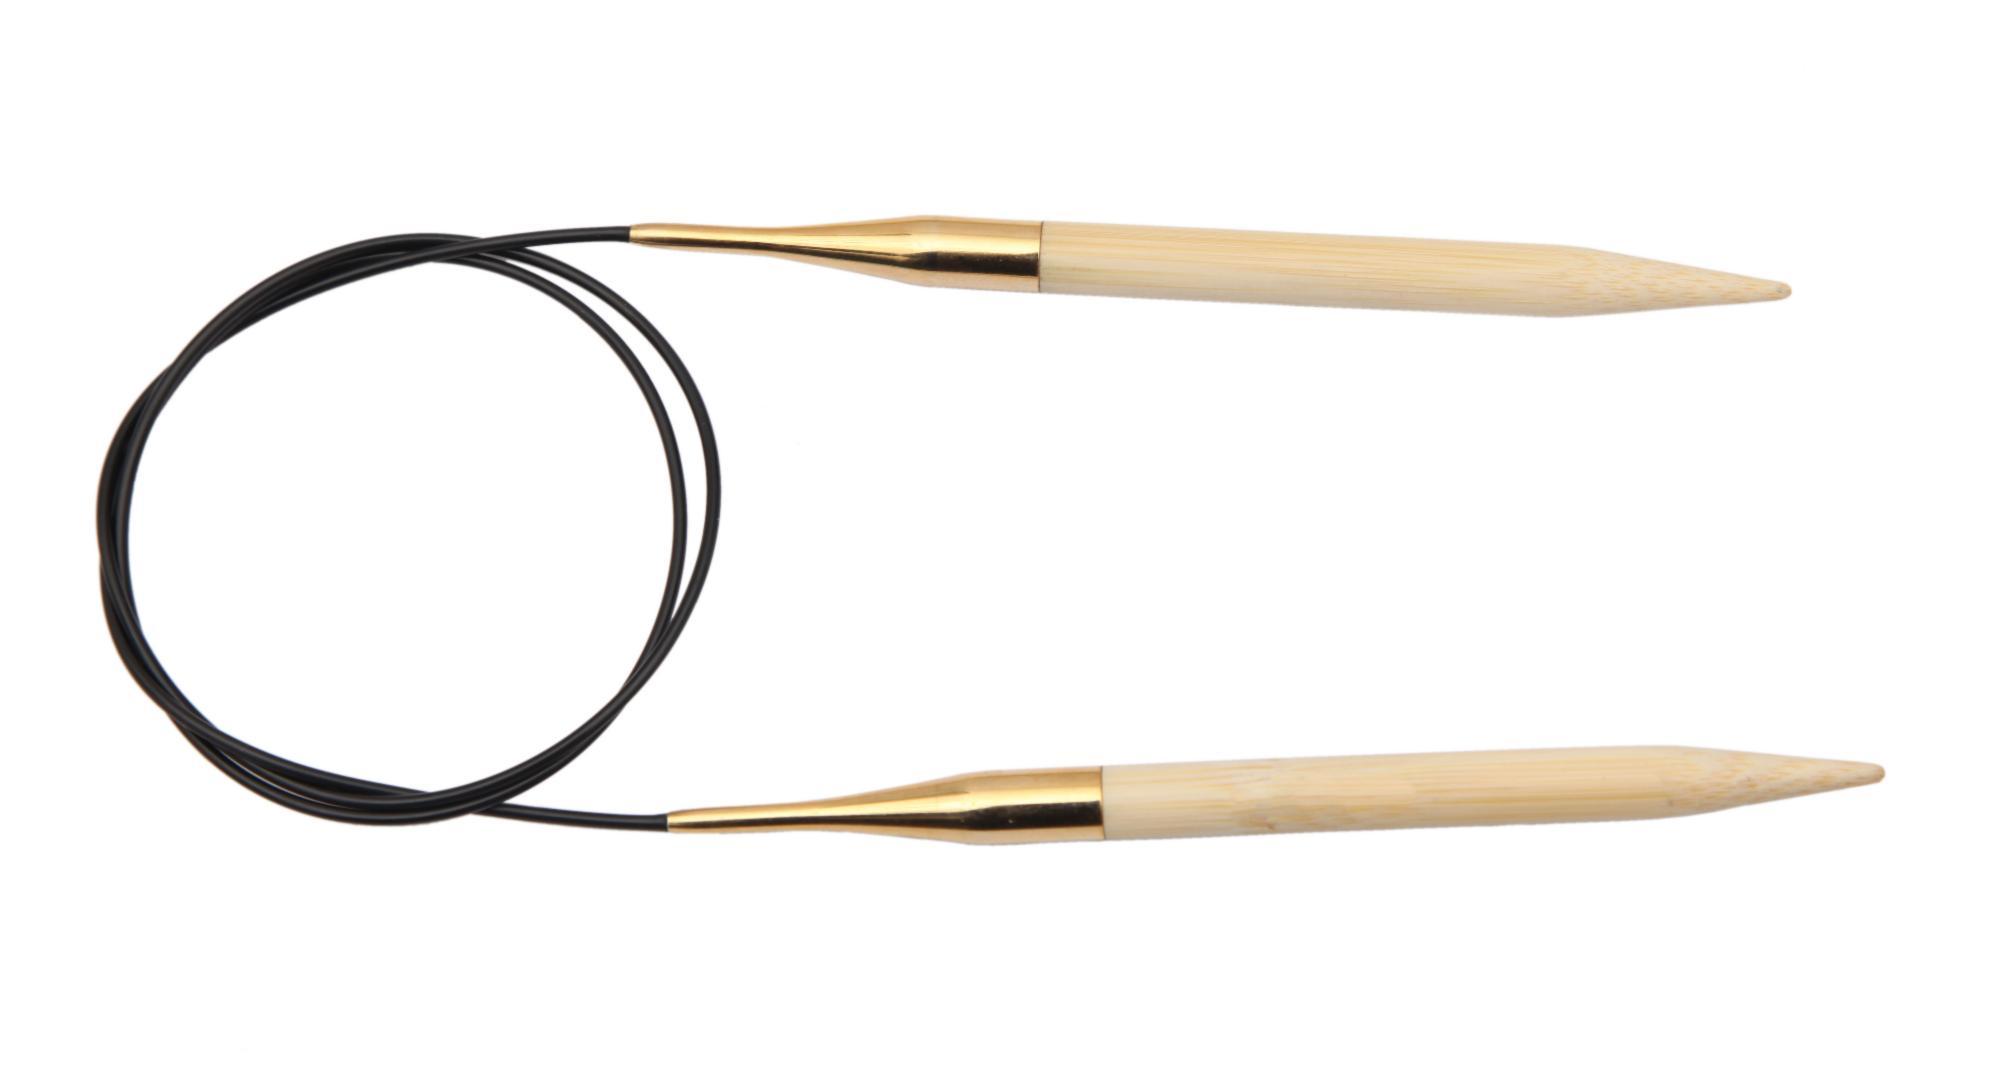 Спицы круговые 60 см Bamboo KnitPro, 22229, 5.00 мм